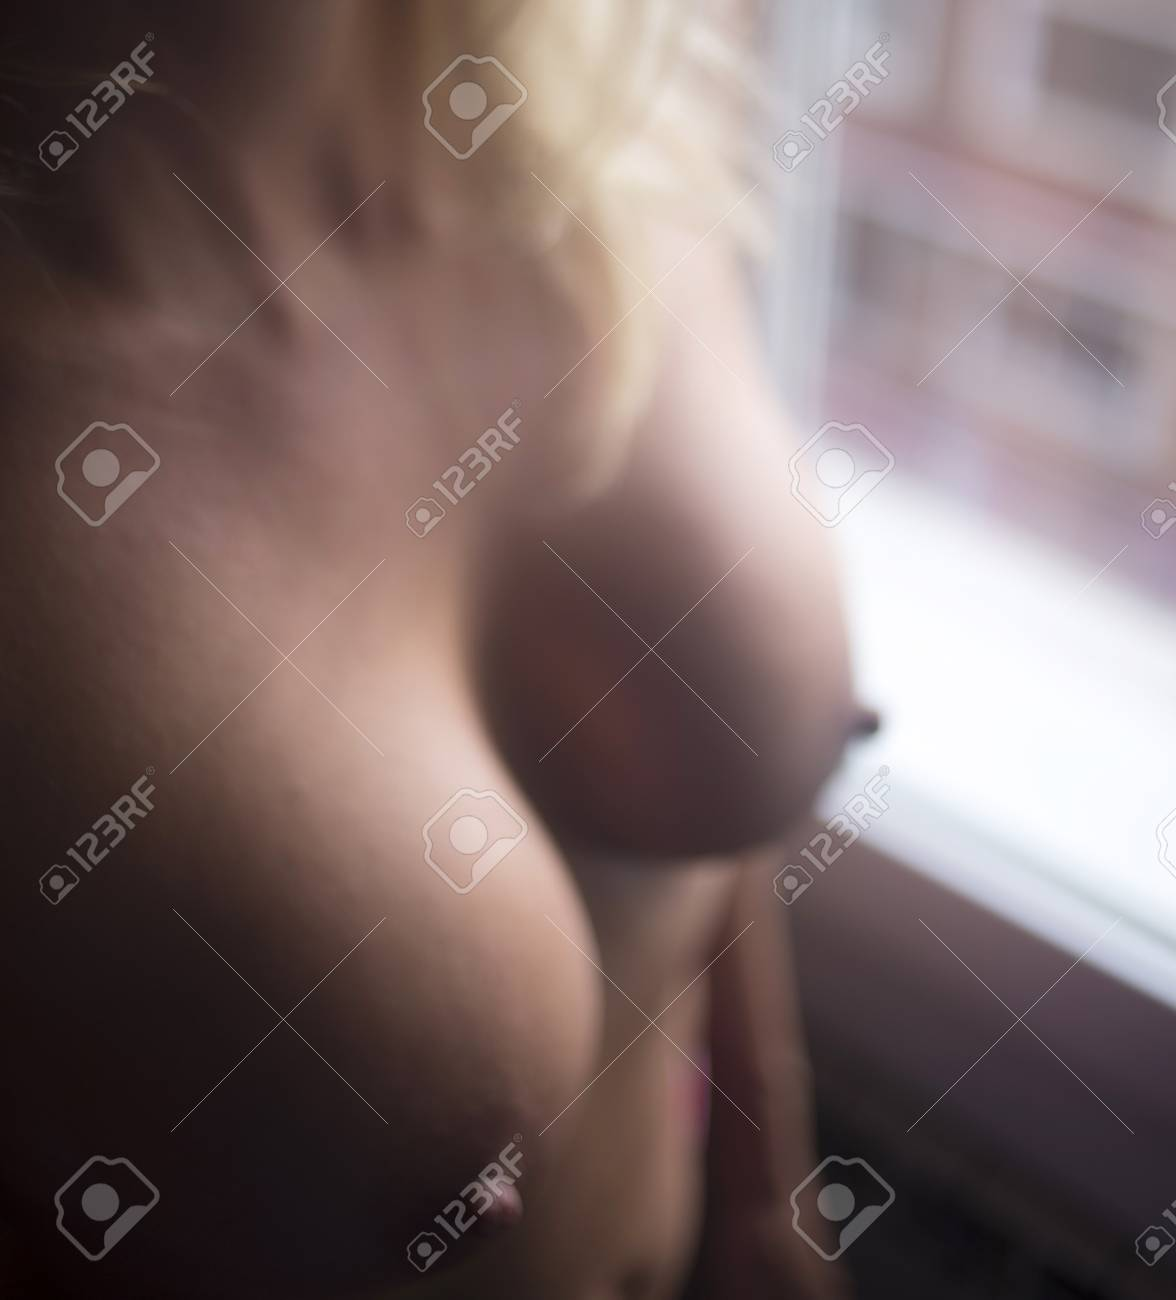 Alissa flexy pussy